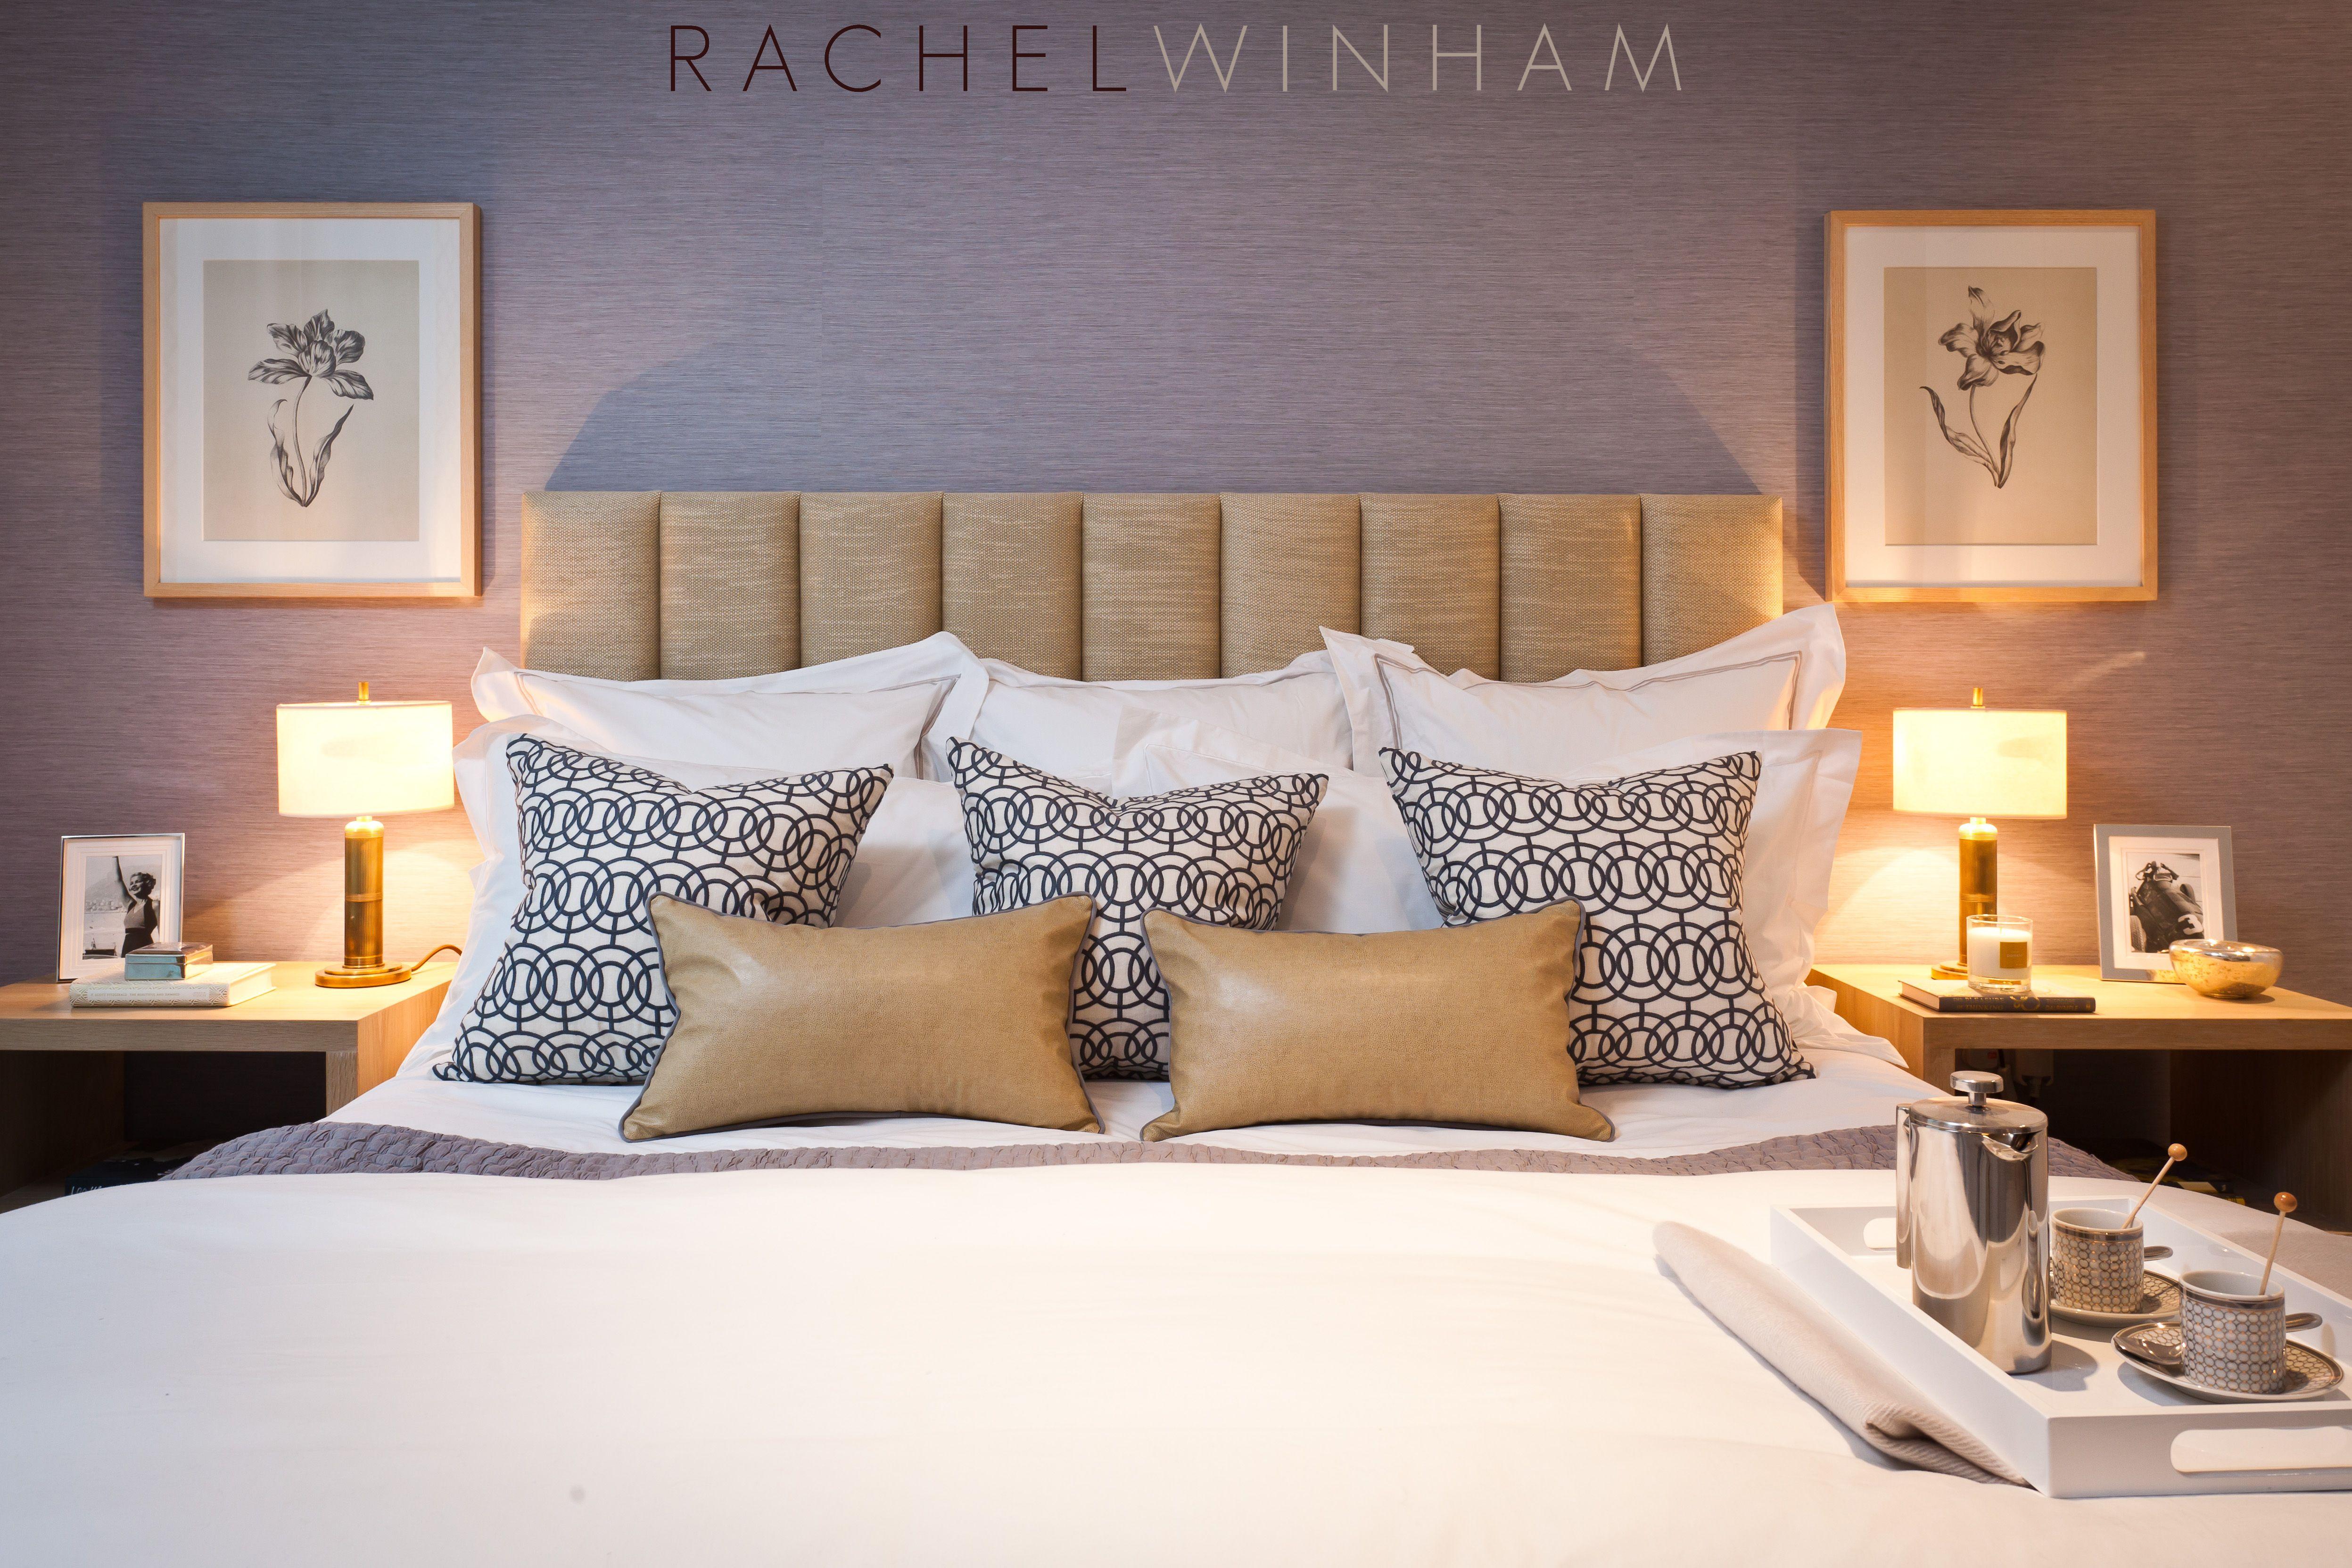 master bedroom rachel winham interior design rw project